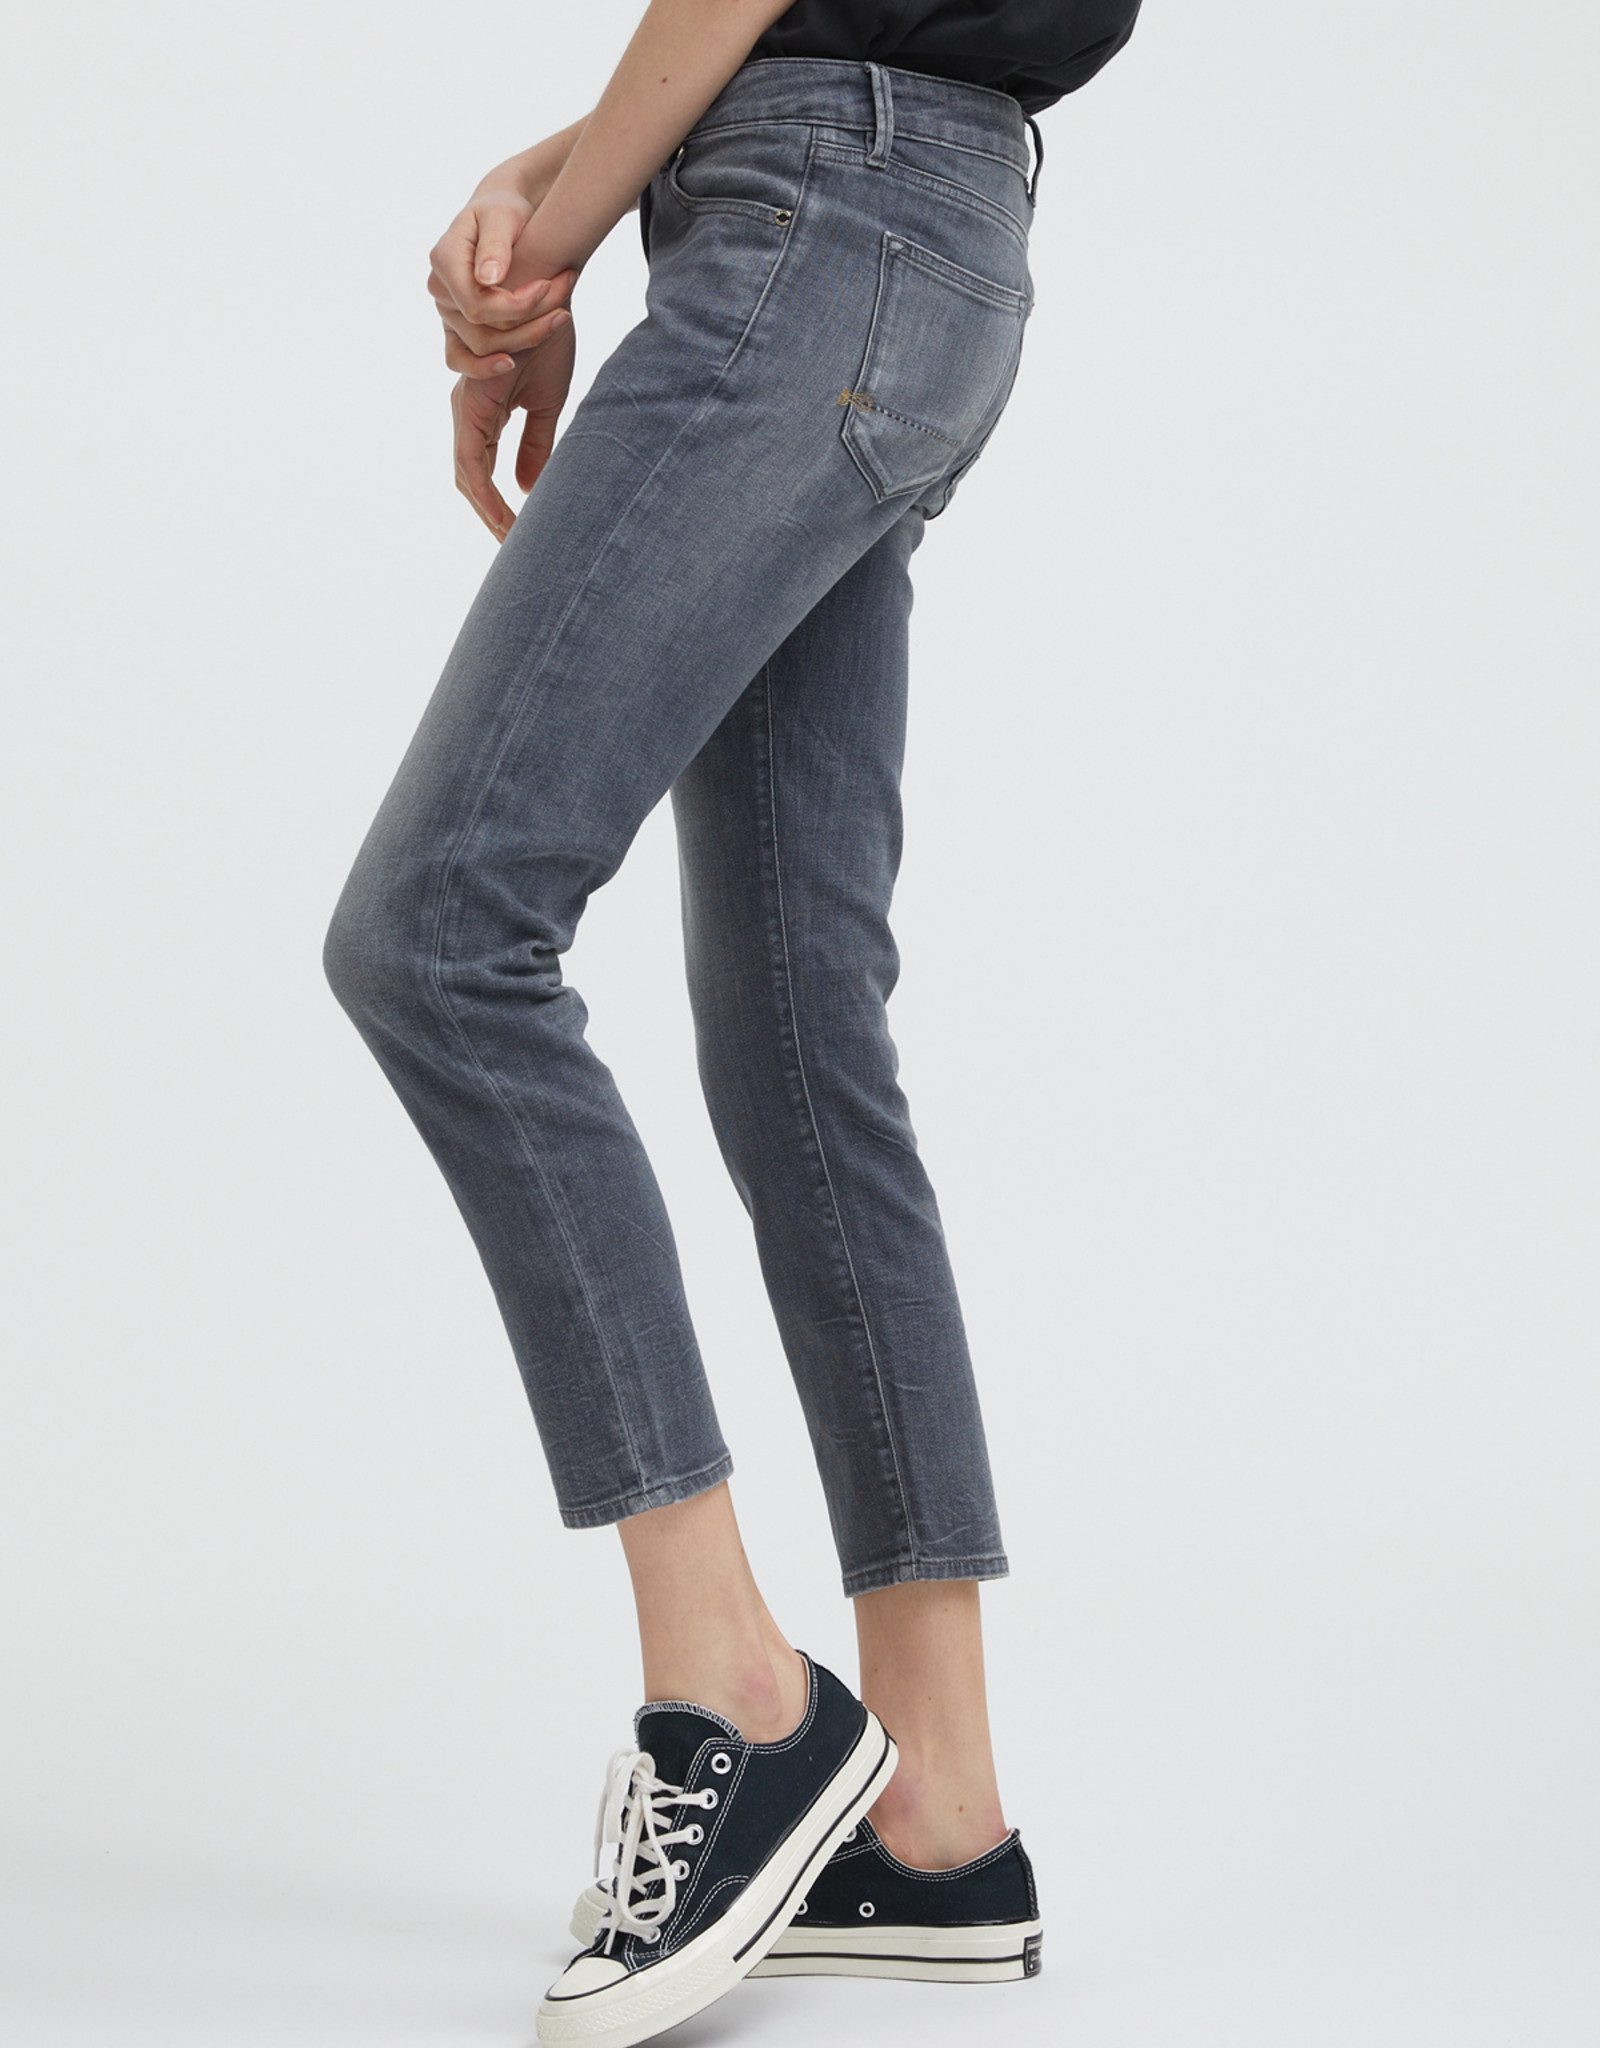 Denham Liz Ankle GRSLGD L28 Grey